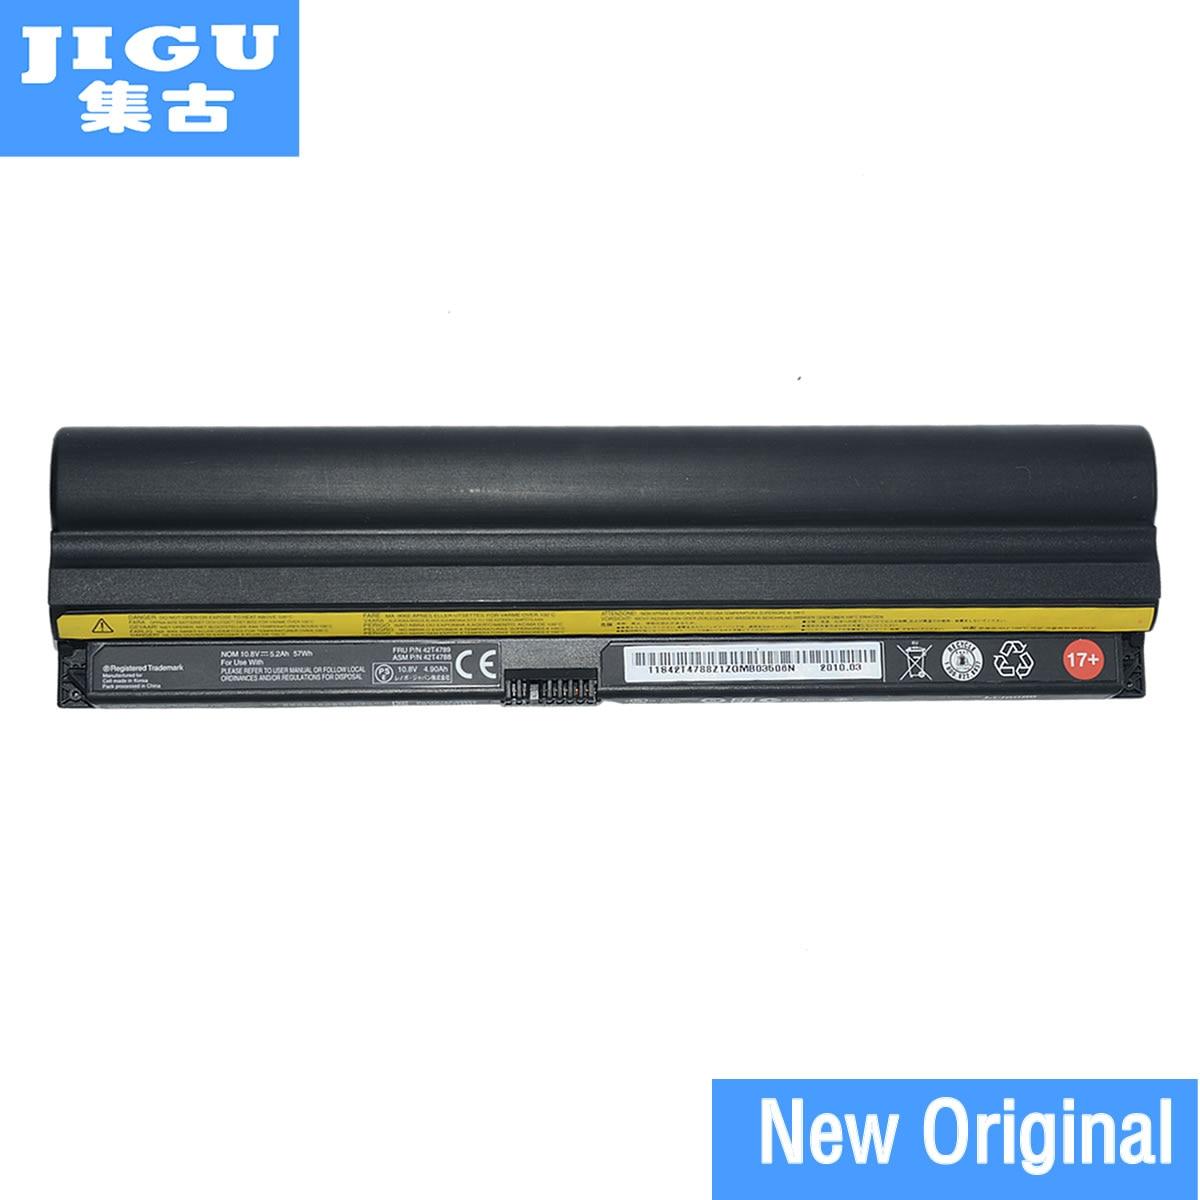 Jigu Original Laptop Battery For Lenovo Thinkpad Edge 11 E10 Keyboard Acer Aspire E1 421 421g 431 431g 471 Mini 10 X100e X120e 108v 57wh 6cells